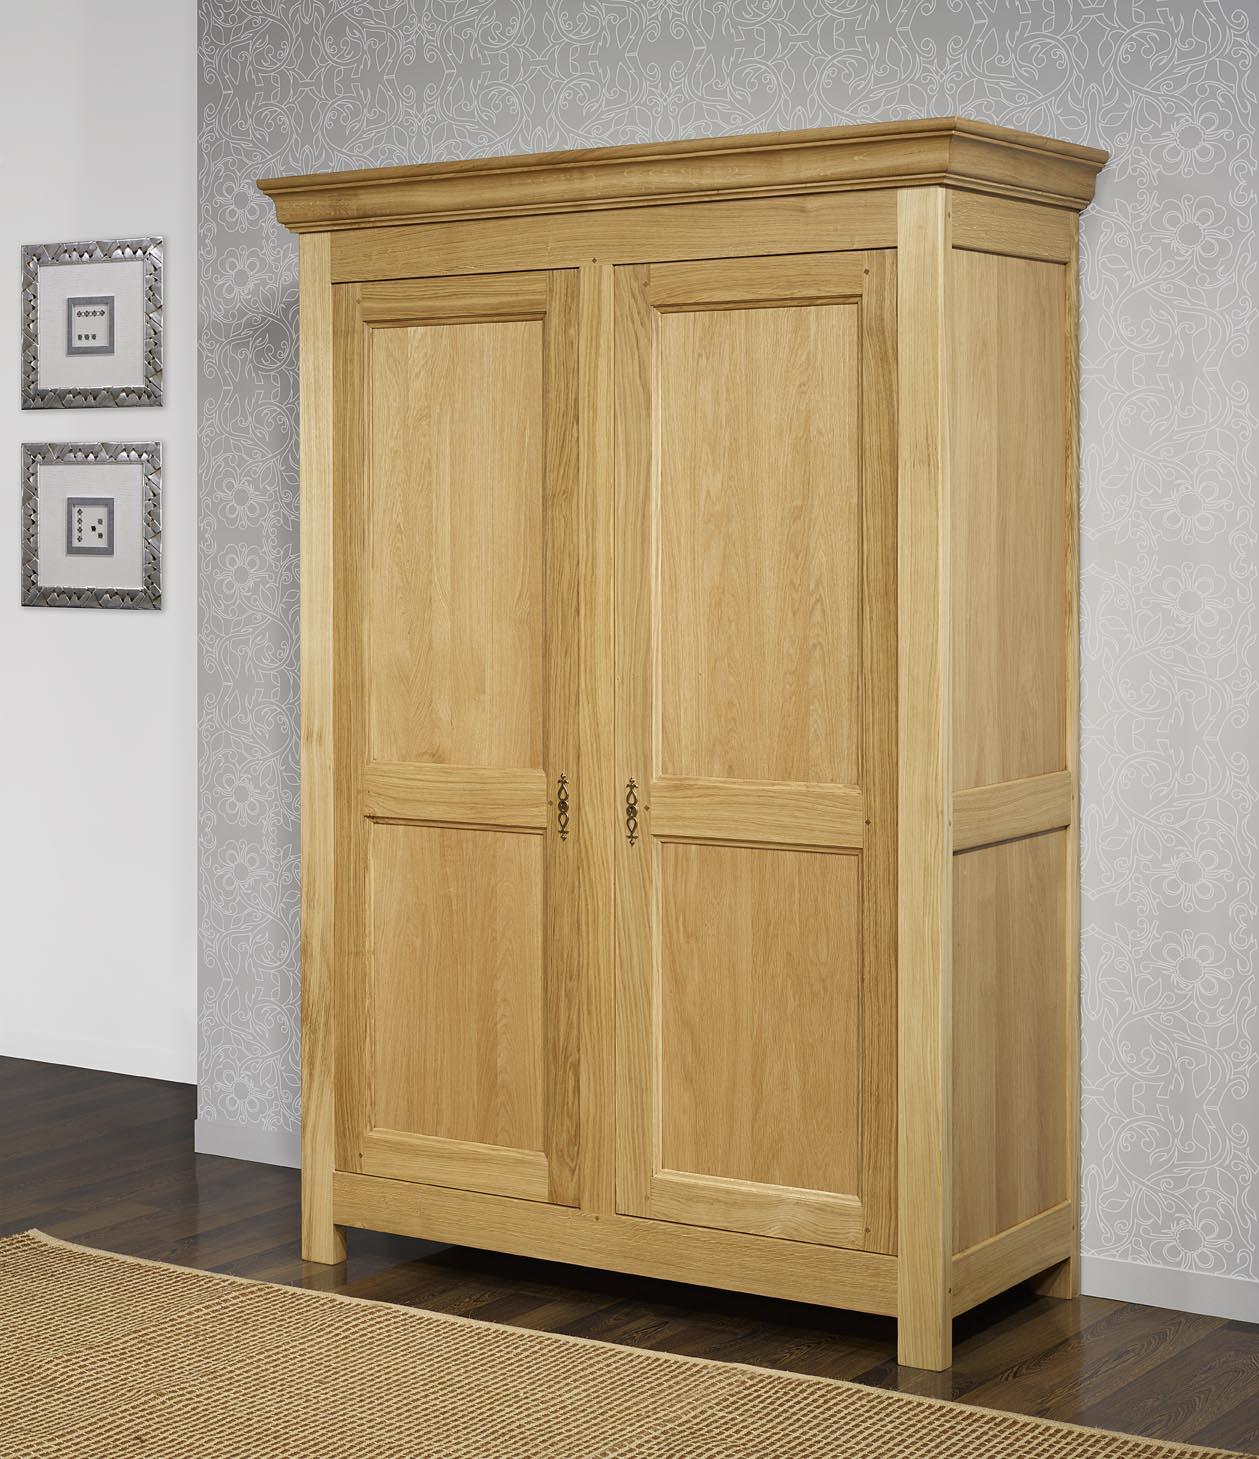 armoire 2 portes en chene massif de style campagnard meuble en chene massif